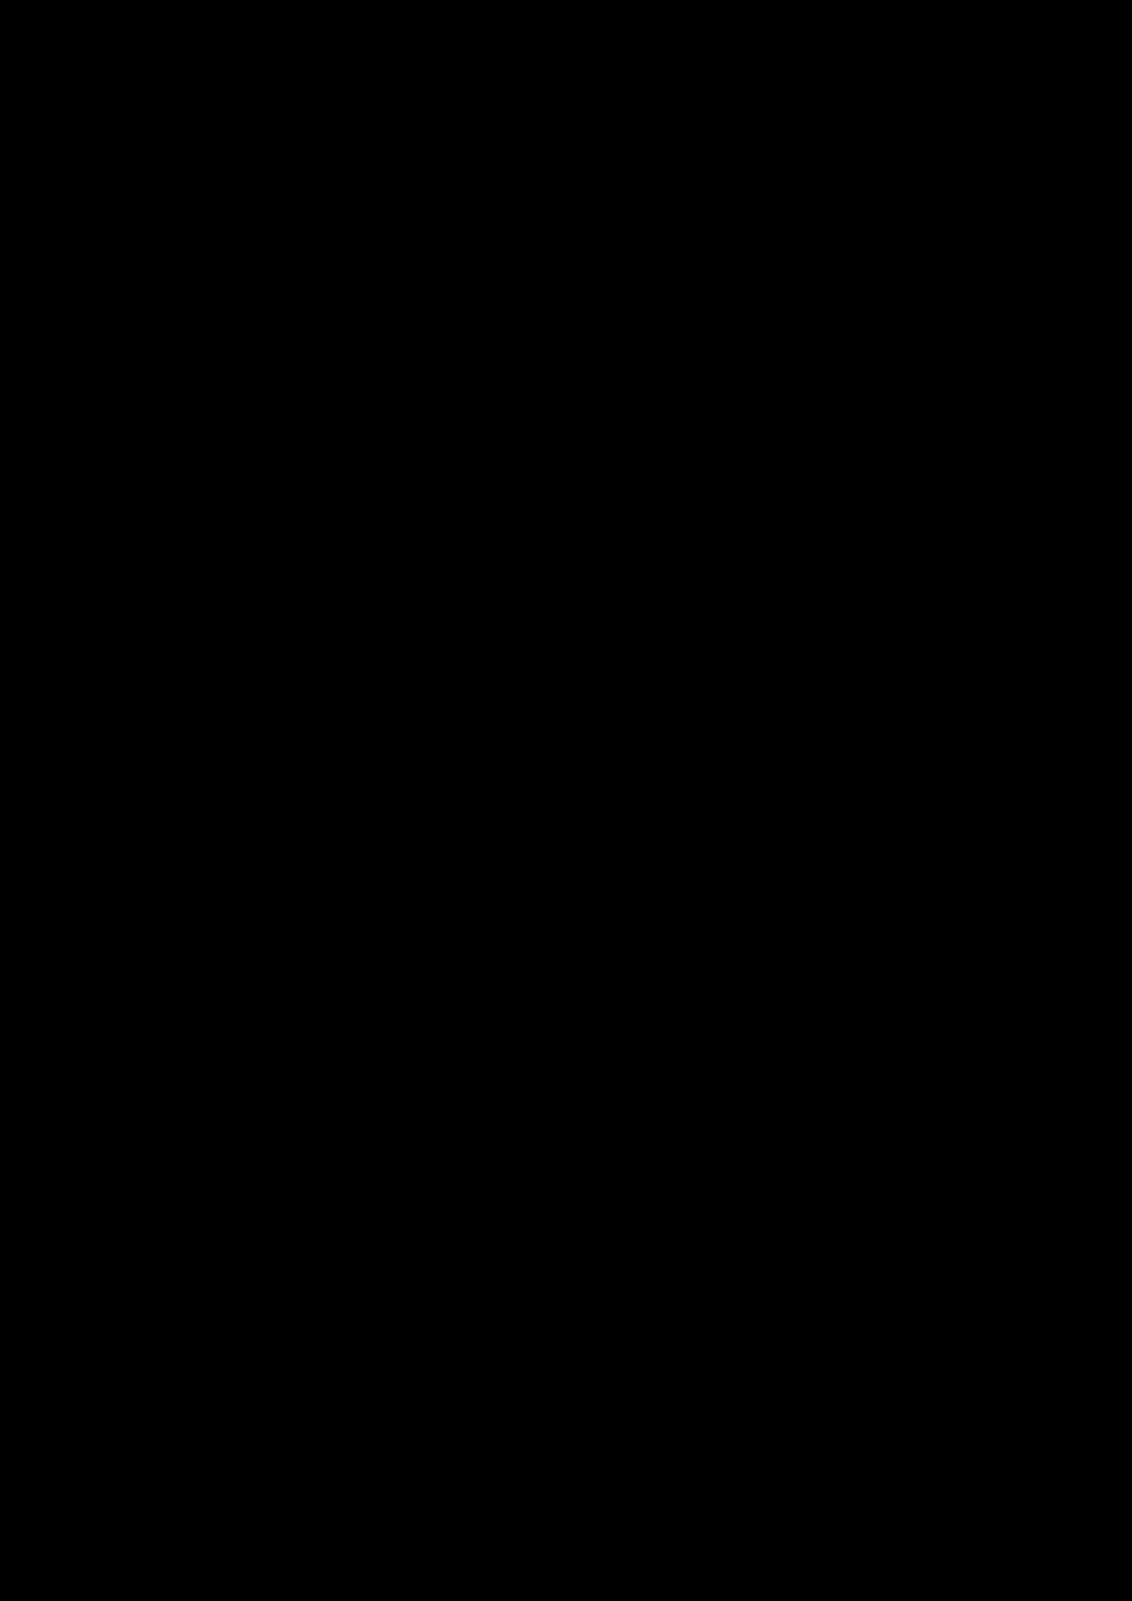 N.A.S.T.YA slide, Image 61